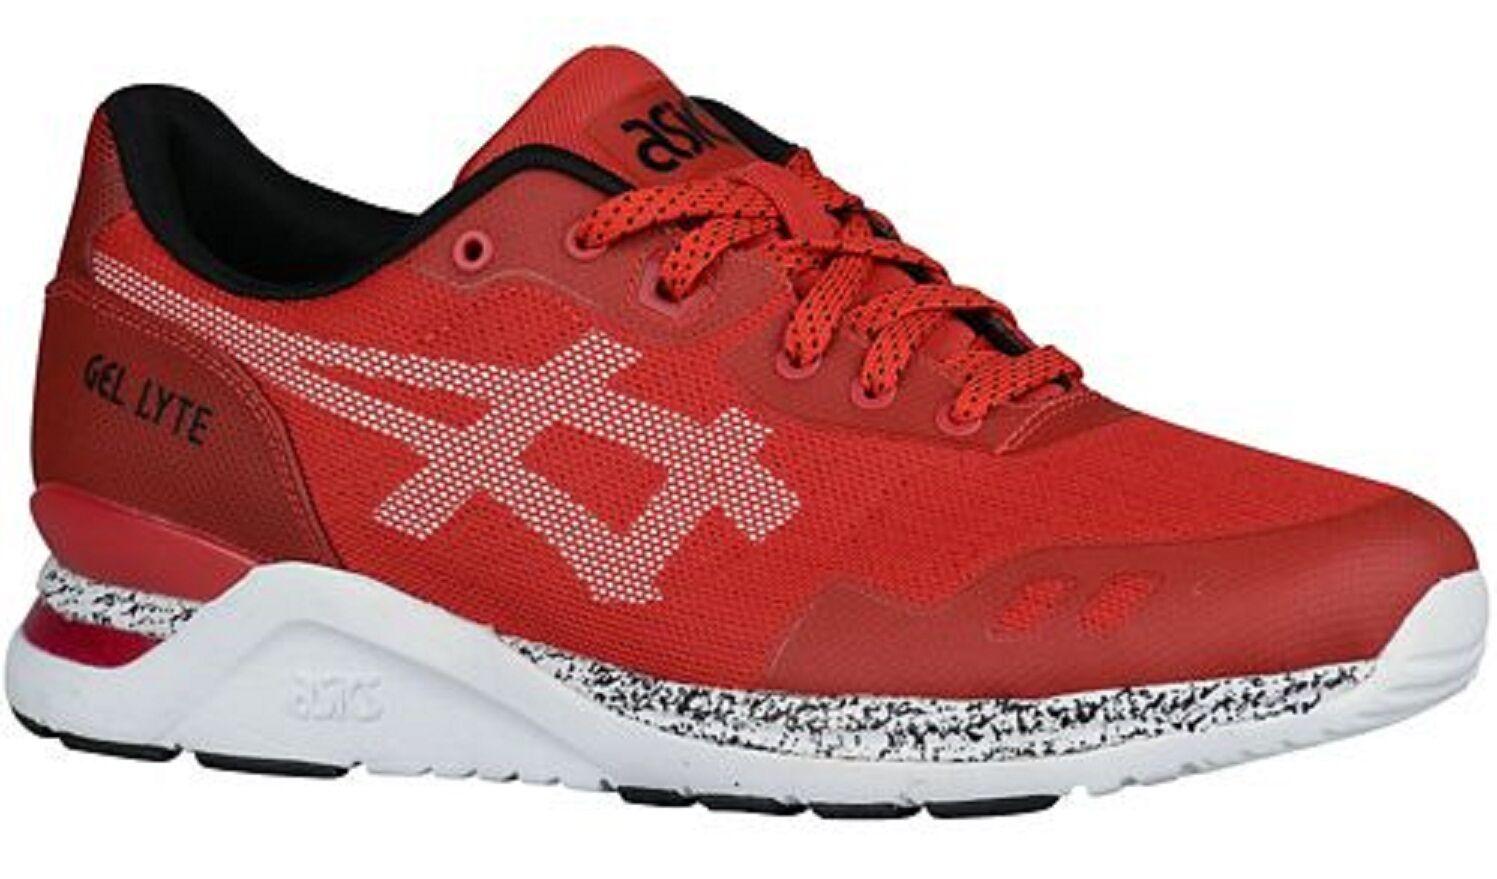 ASICS HN544.2301 GEL-LYTE EVO NT Mn's (M) Red White Mesh Lifestyle shoes